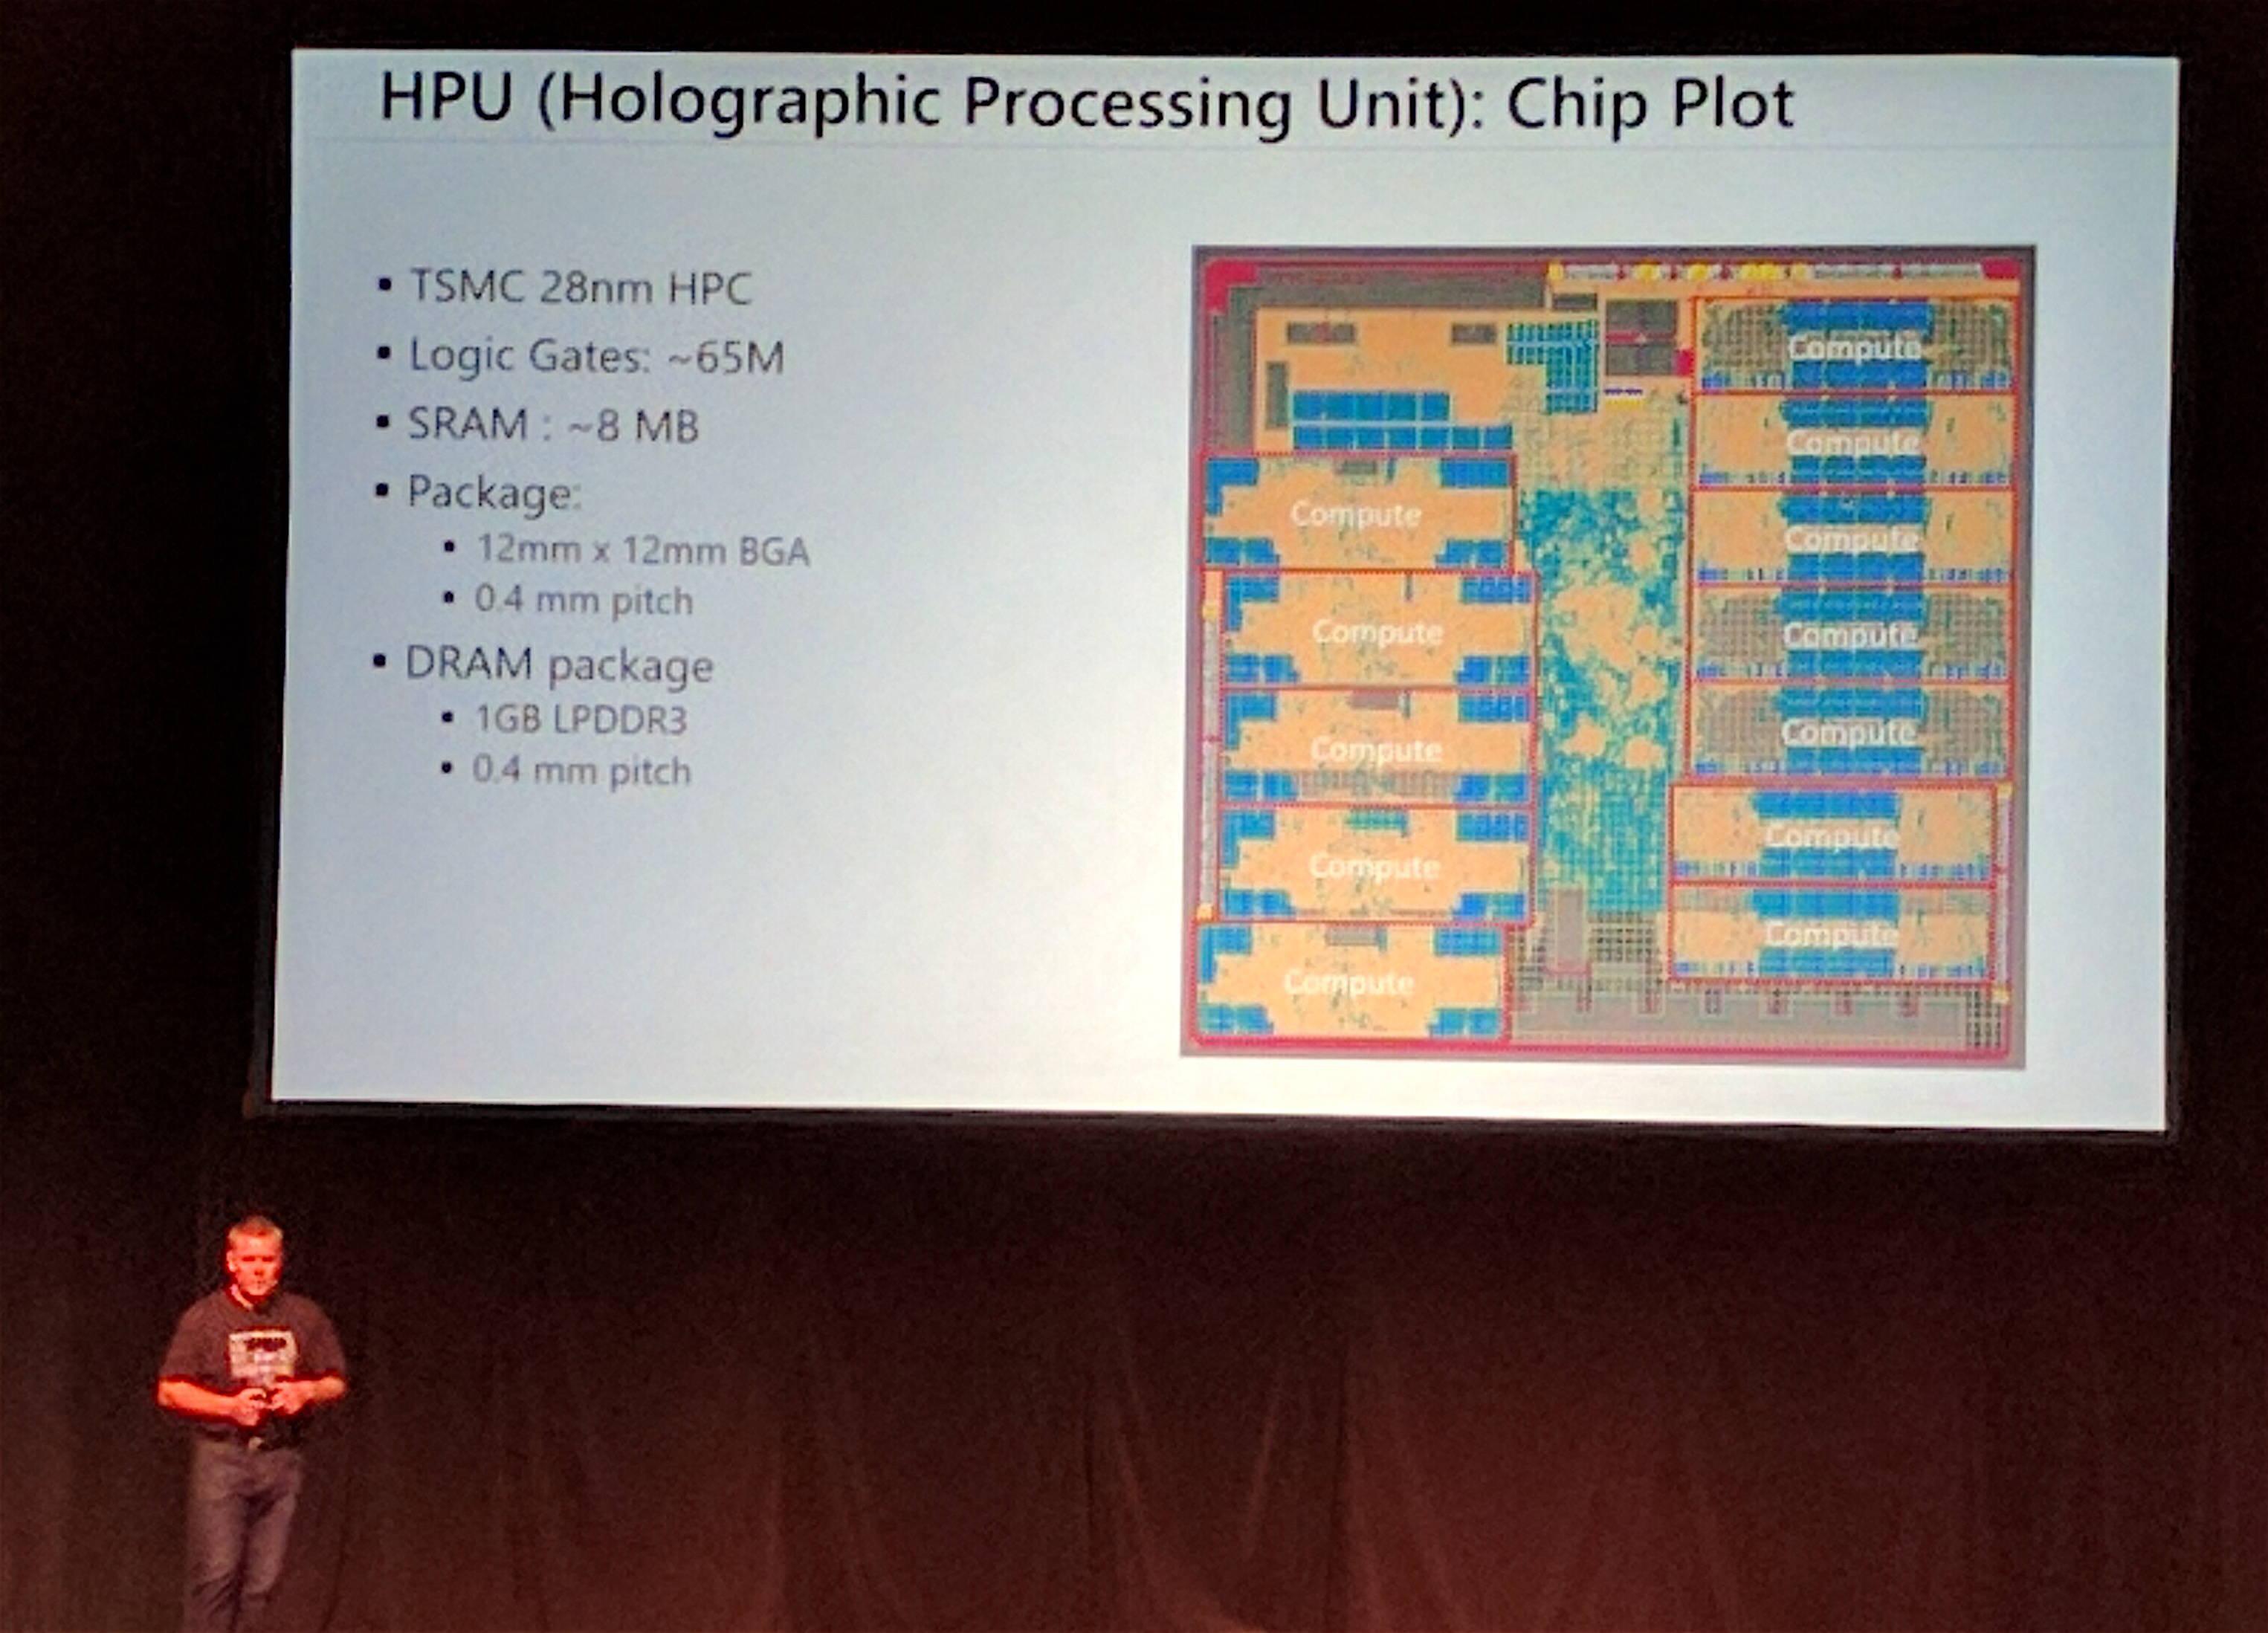 HoloLens 2 tipped to use Qualcomm XR1 VR chip - SlashGear